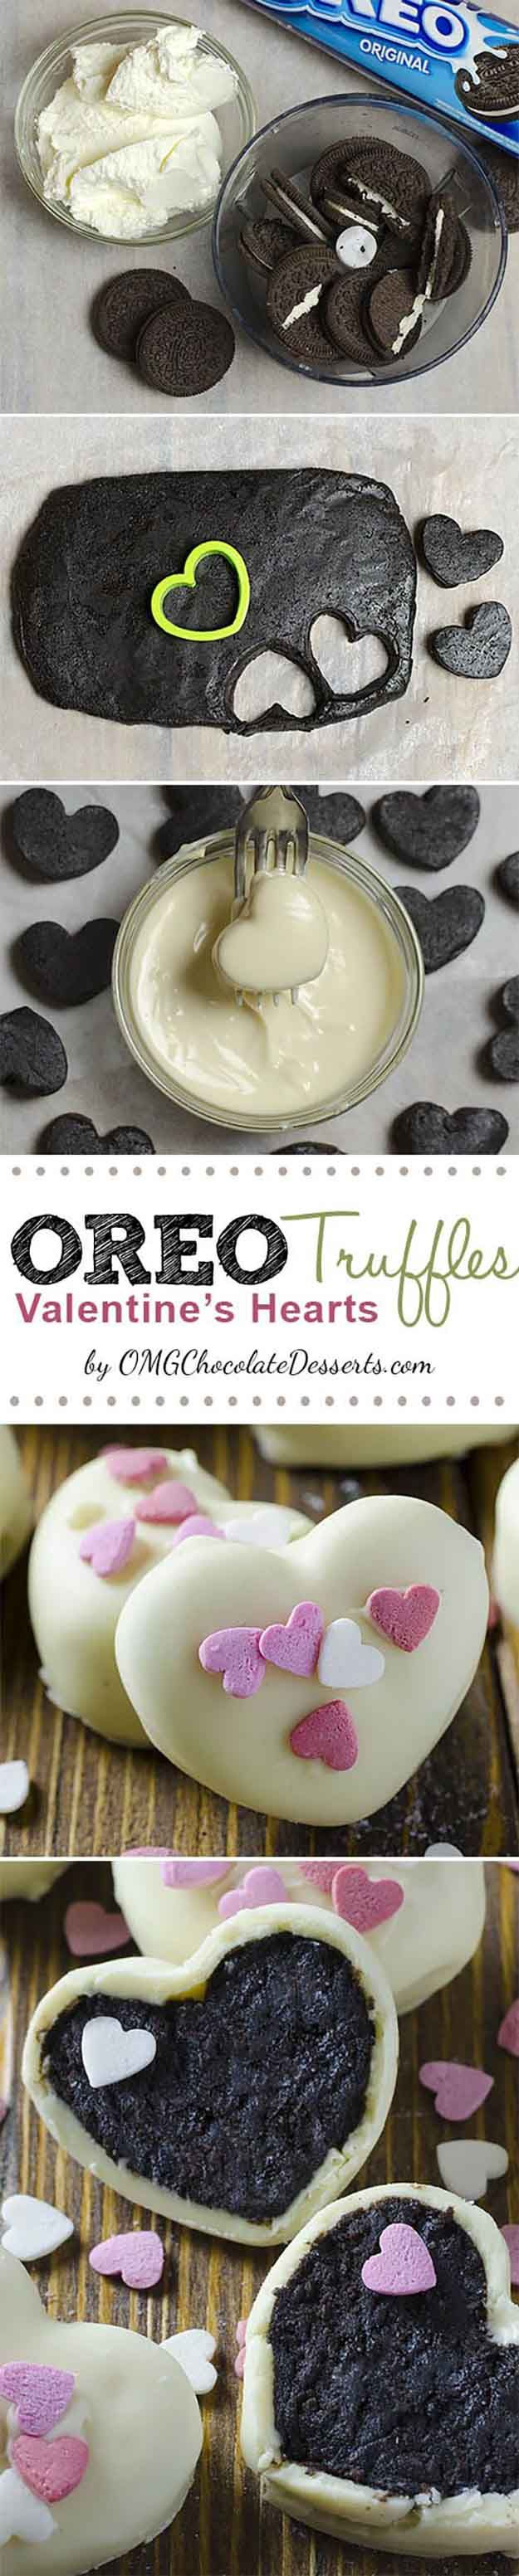 Oreo Truffle Valentines Hearts | 25 Valentines Day Treats That Look Way Too Good...